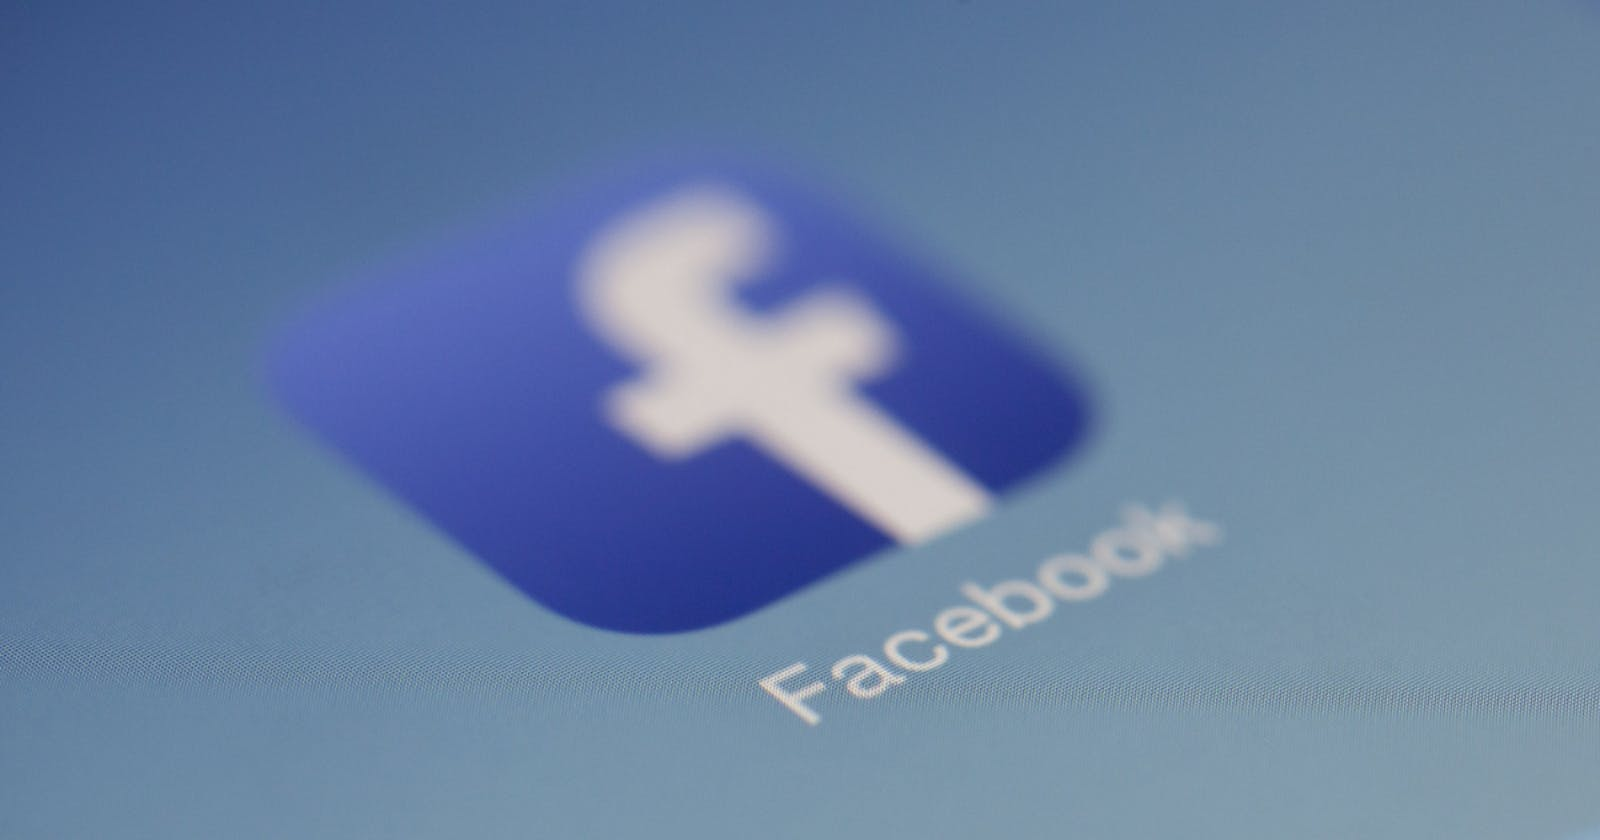 Deep dive into the Facebook photo description system